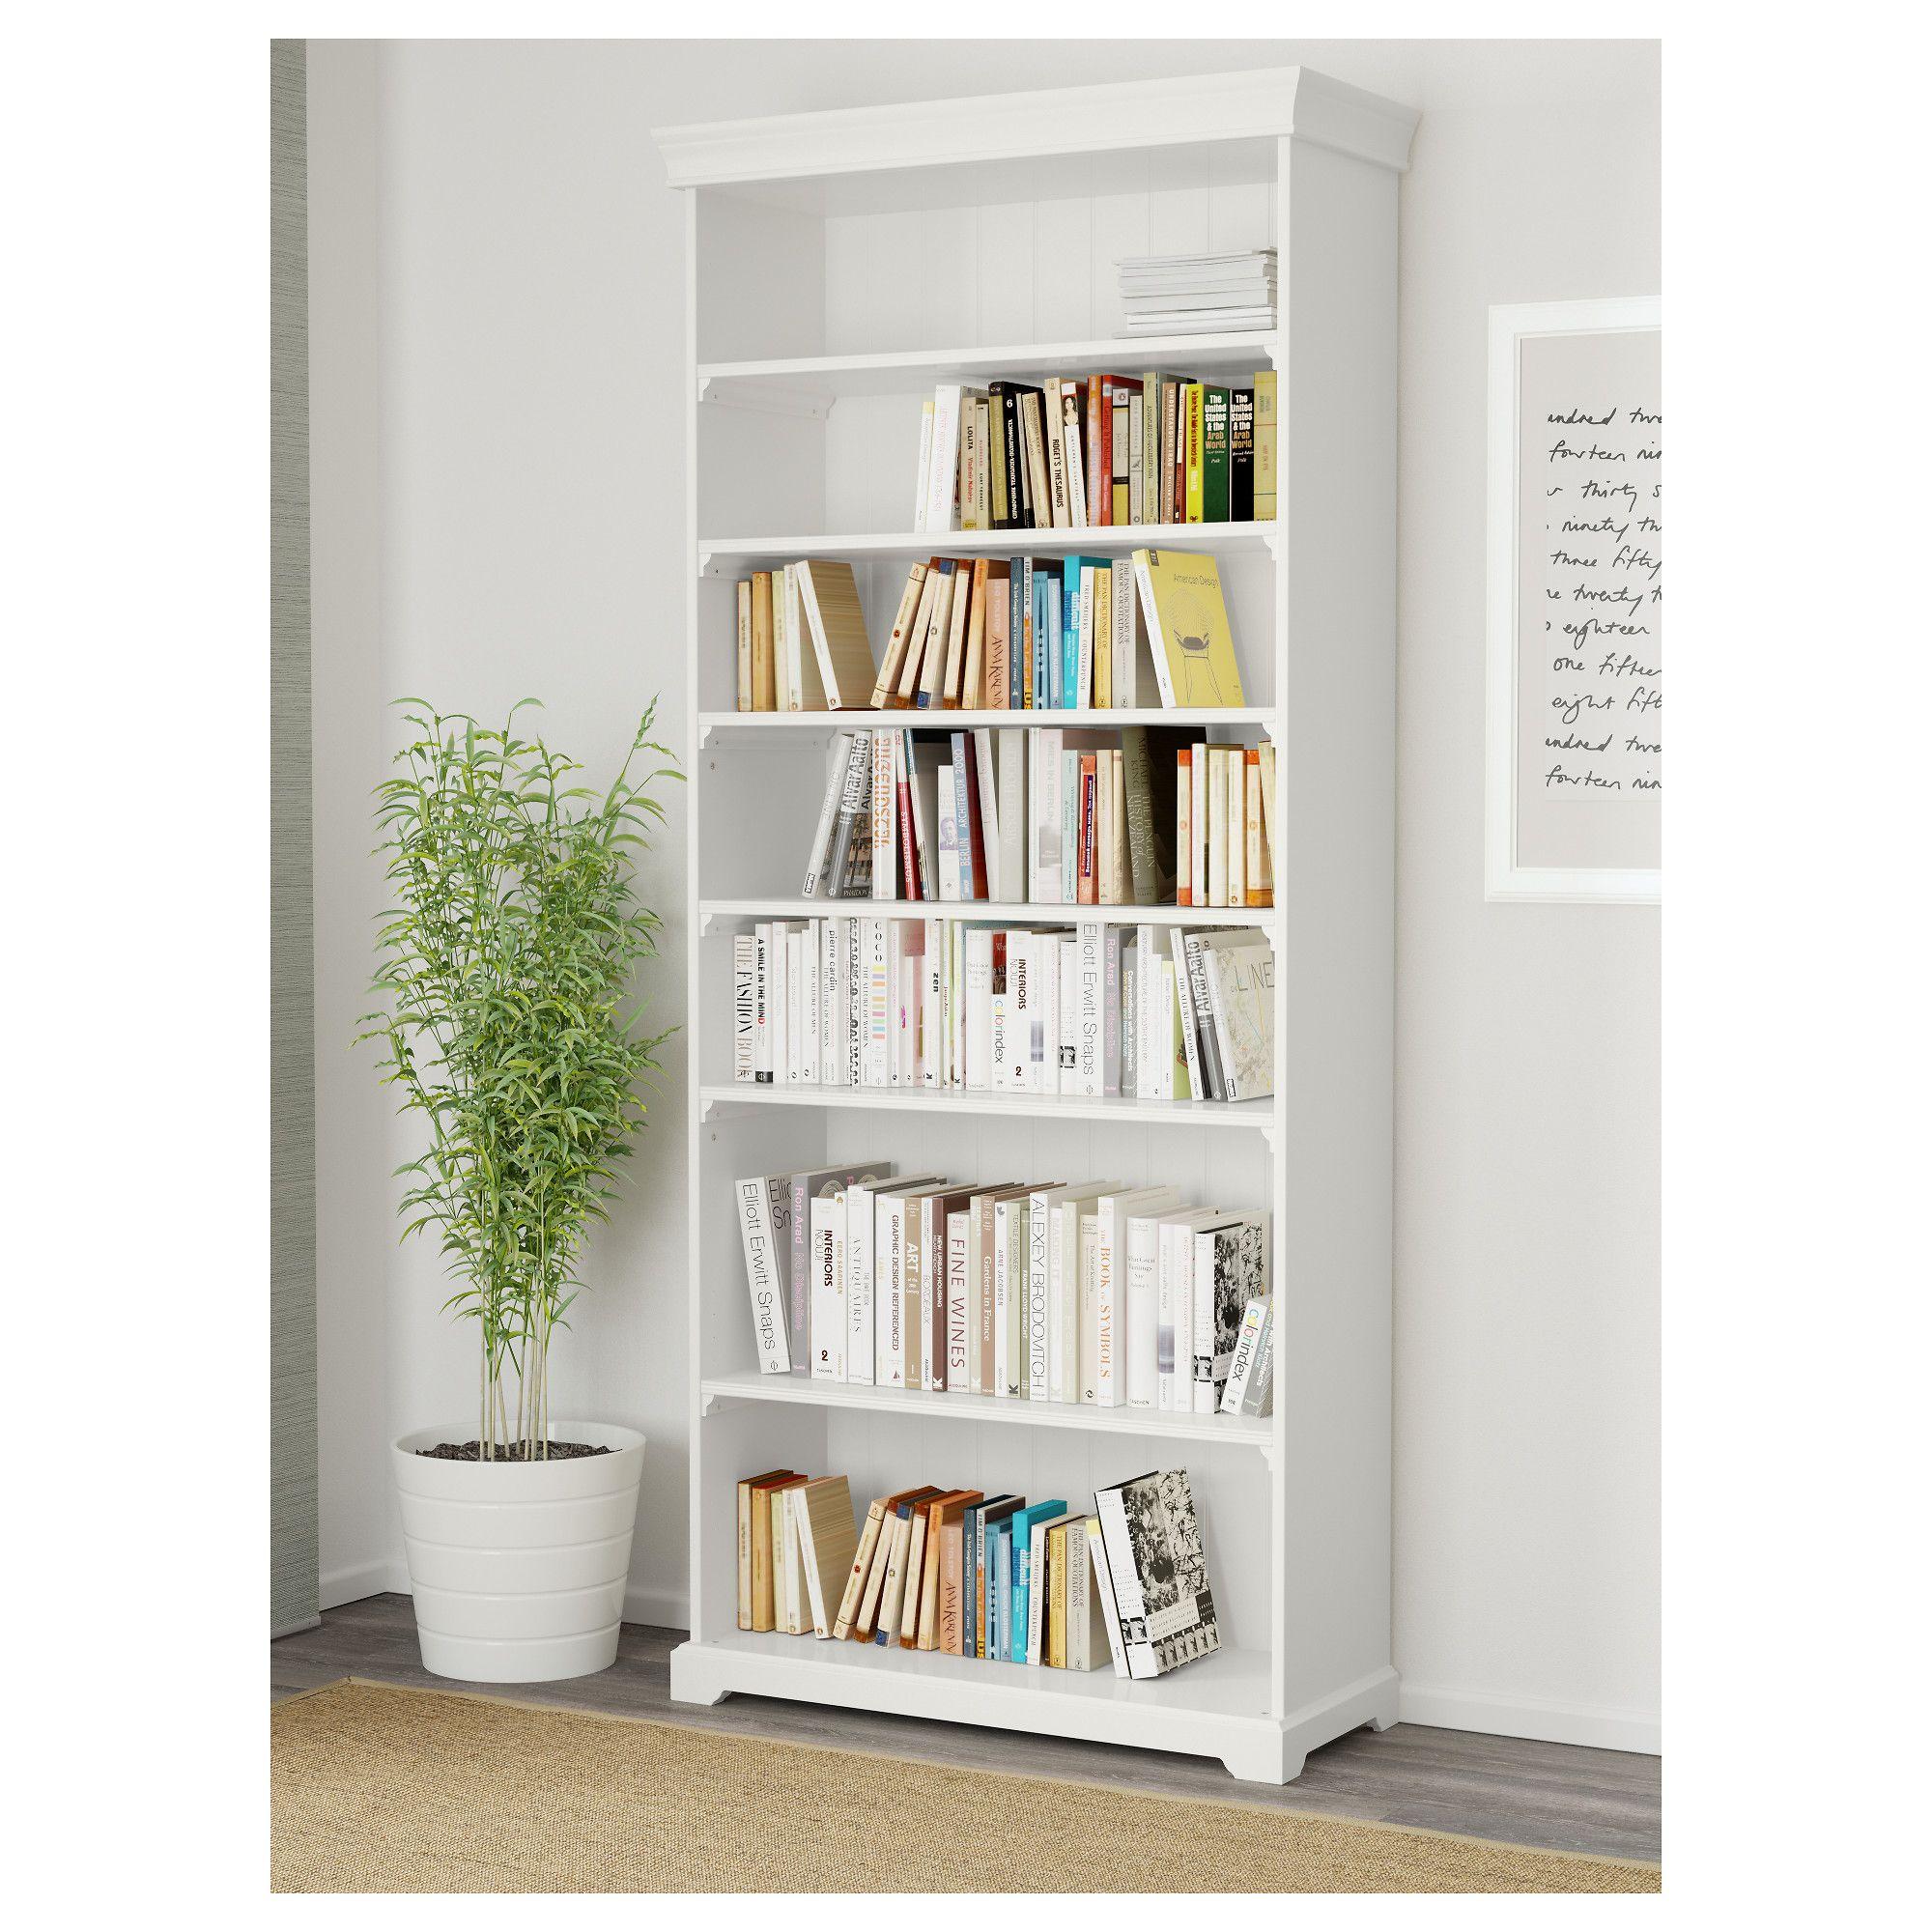 Bookcase Liatorp White Liatorp Shelving And Storage Ideas # Muebles Ikea Serie Liatorp